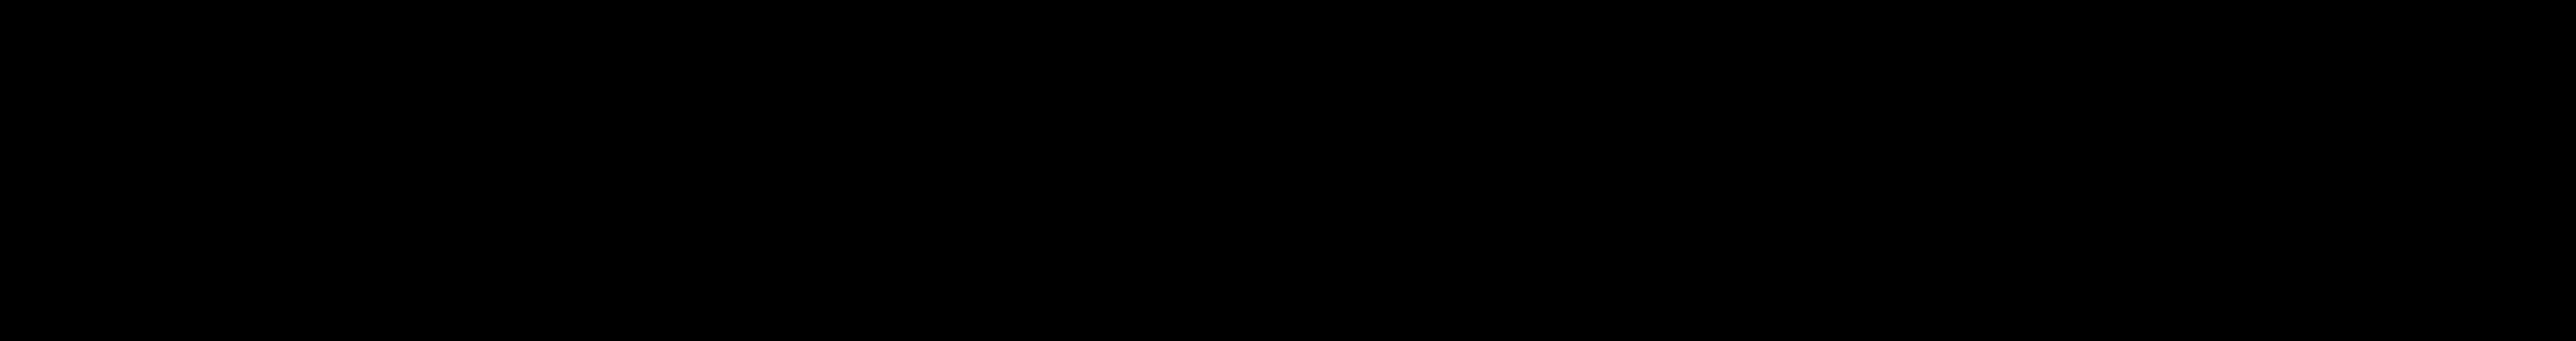 logo__camillaandmarc